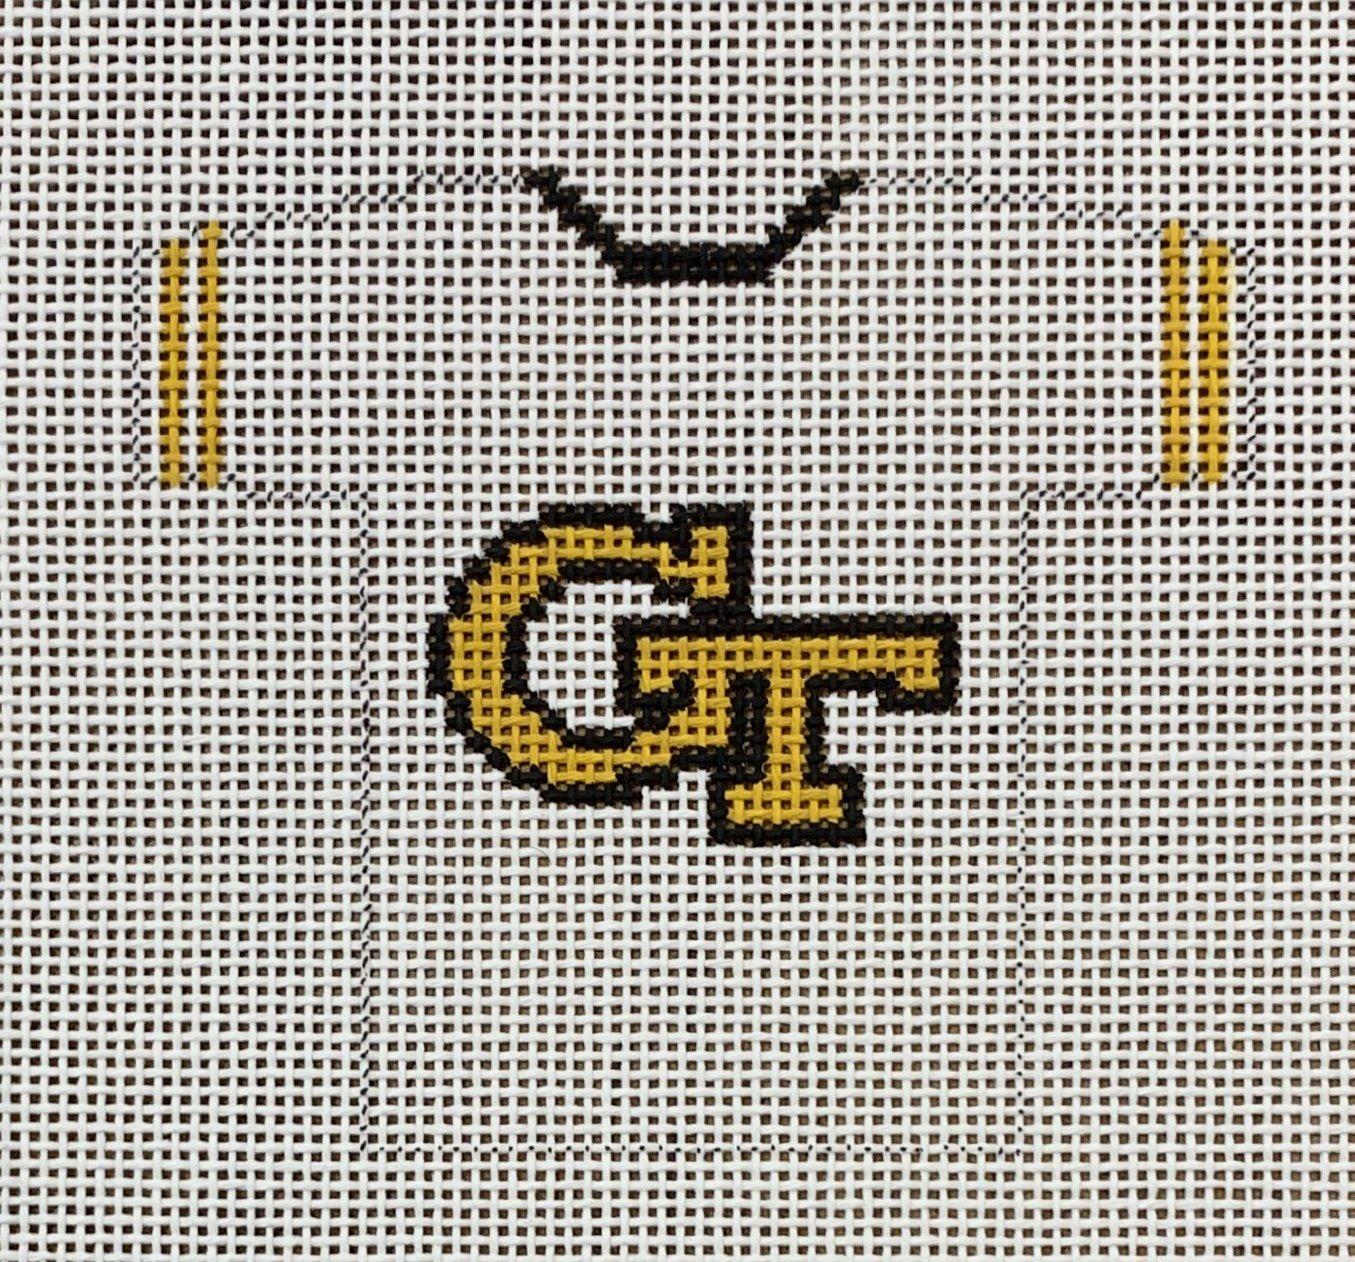 Georgia Tech Jersey